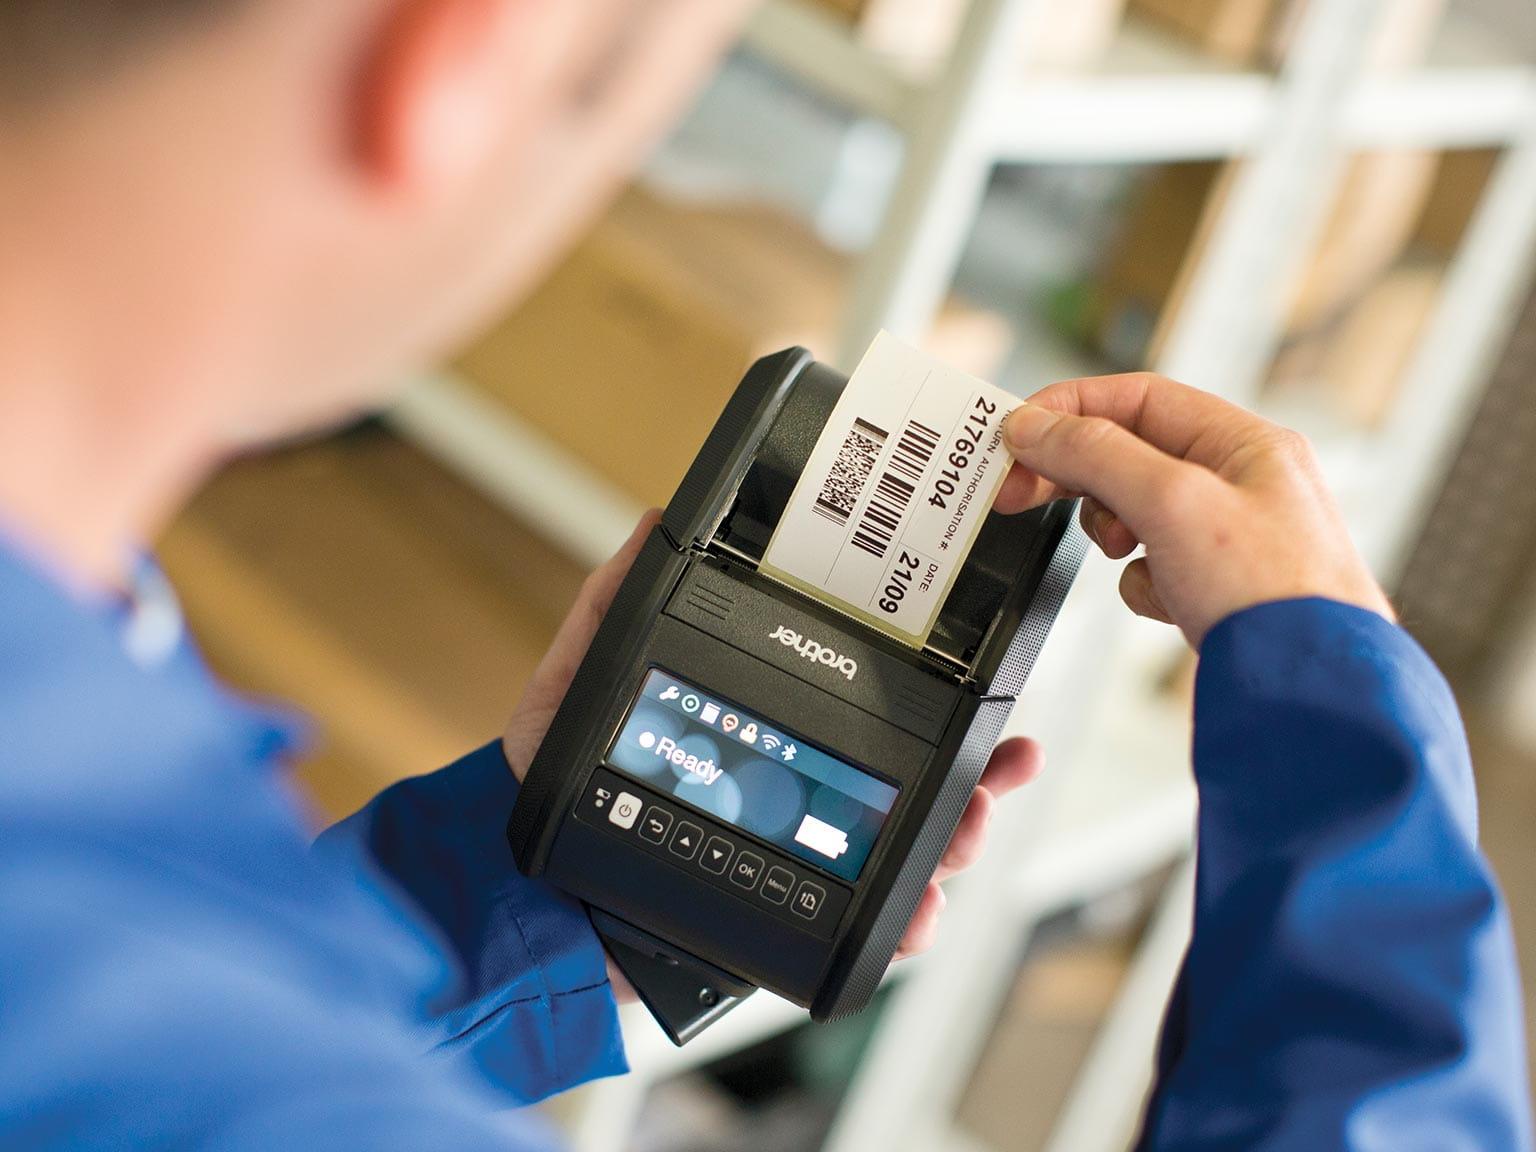 En lagerarbeider har en Brother mobil skriver i RJ-serien i hånden mens en etikett skrives ut